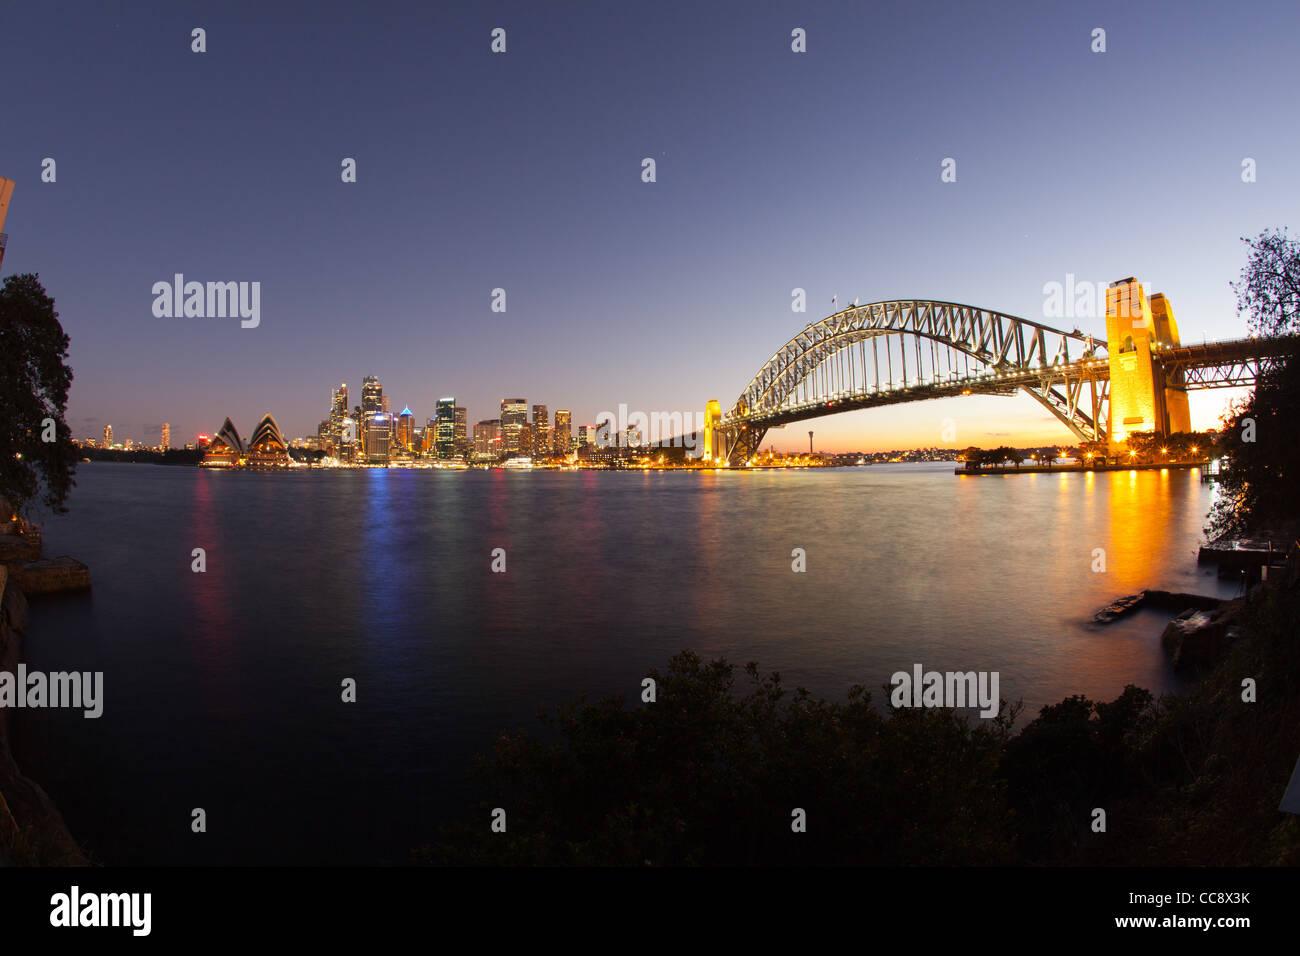 Sydney Harbour Bridge and city skyline from Kirribilli  at night - Stock Image